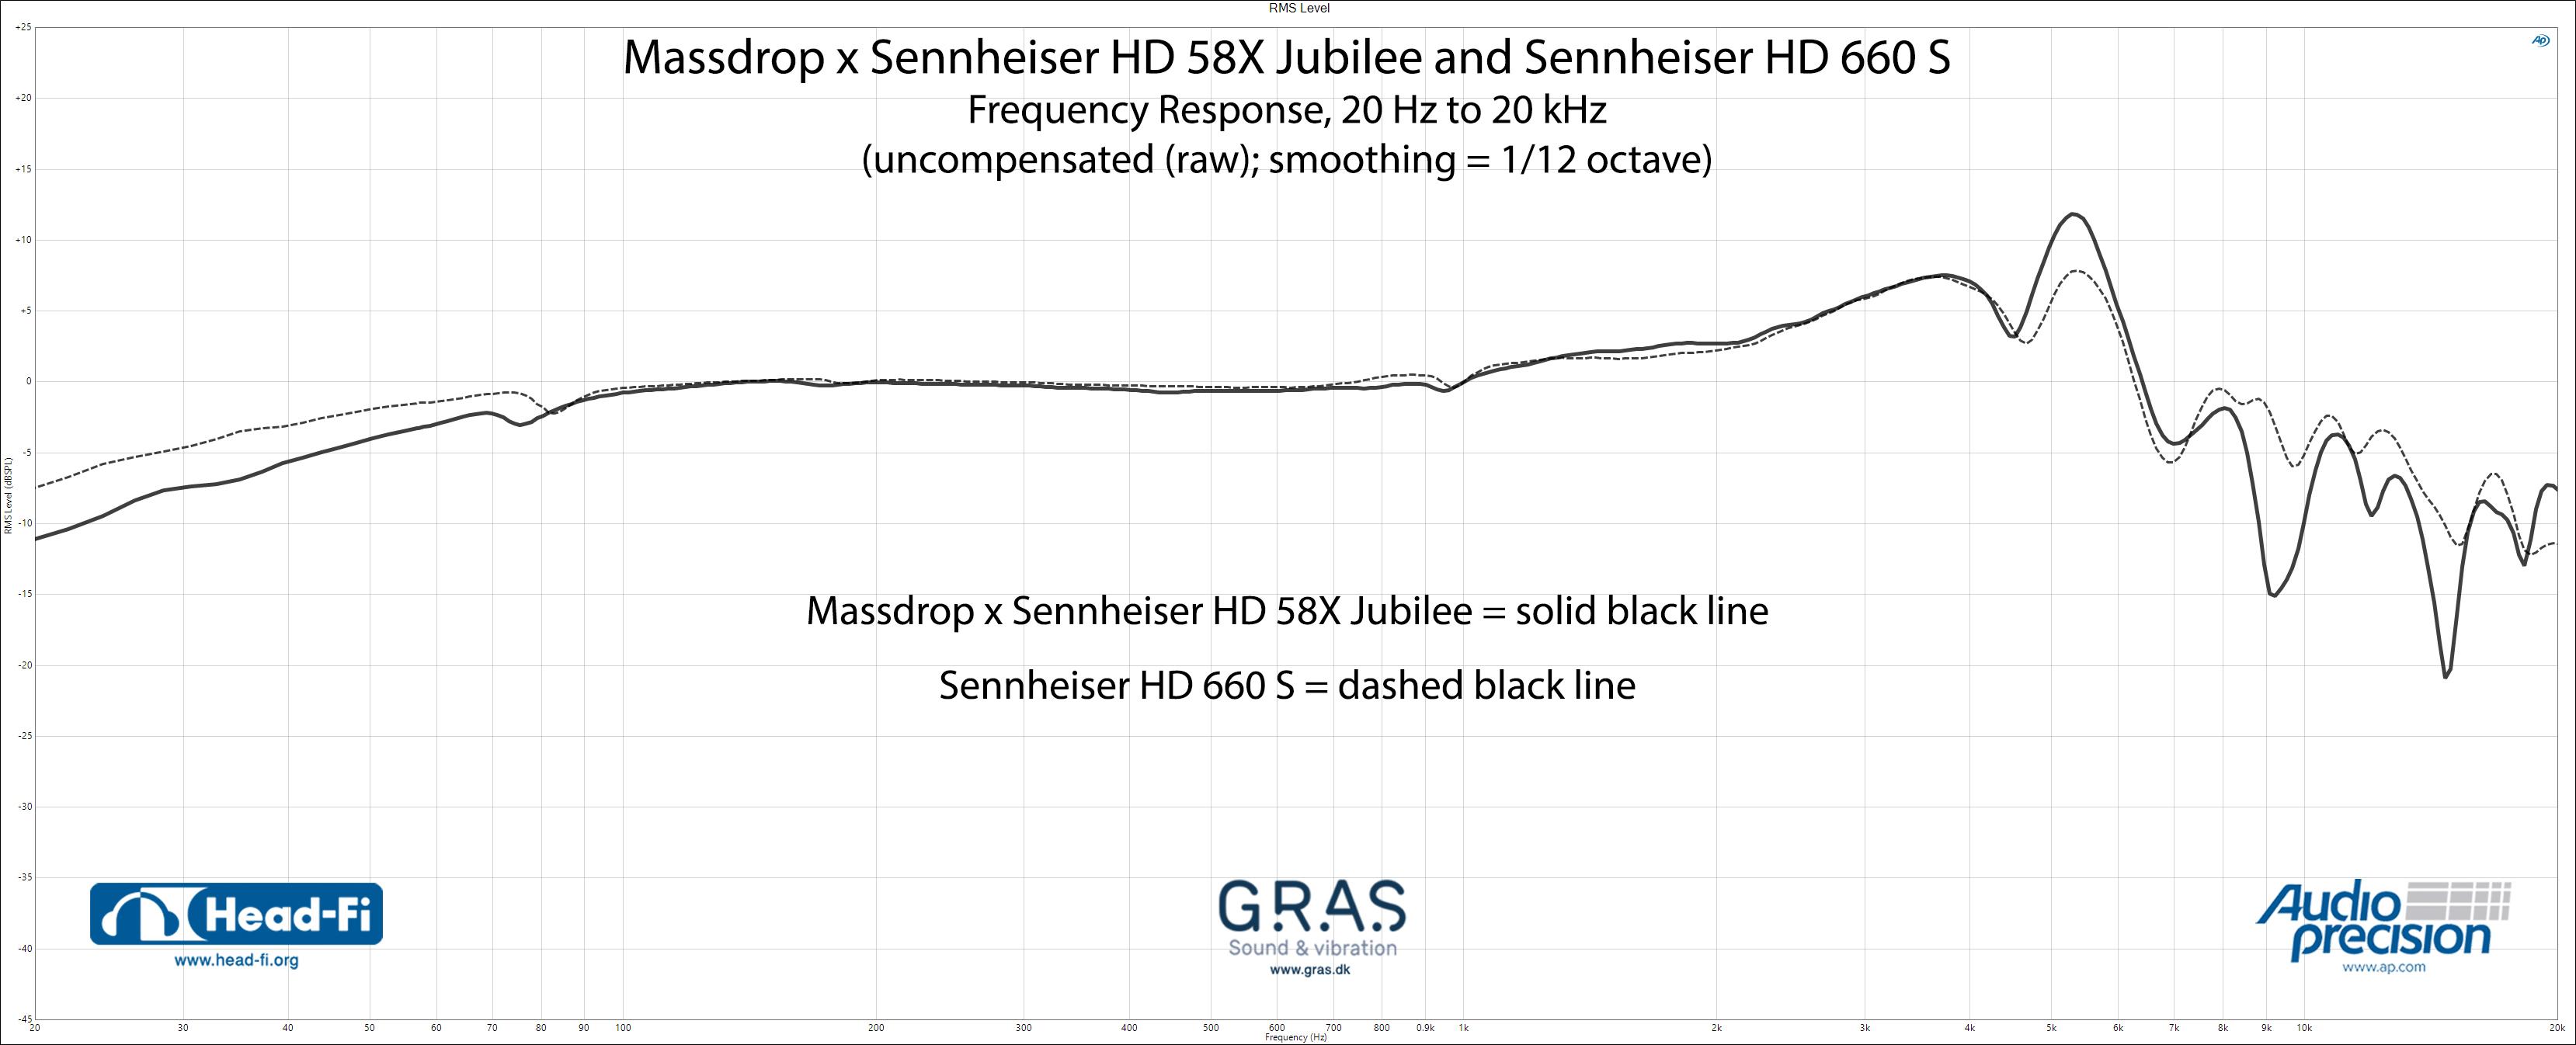 RMS-Level---Massdrop-x-Sennheiser-HD58X-Jubilee---Sennheiser-HD660S.jpg